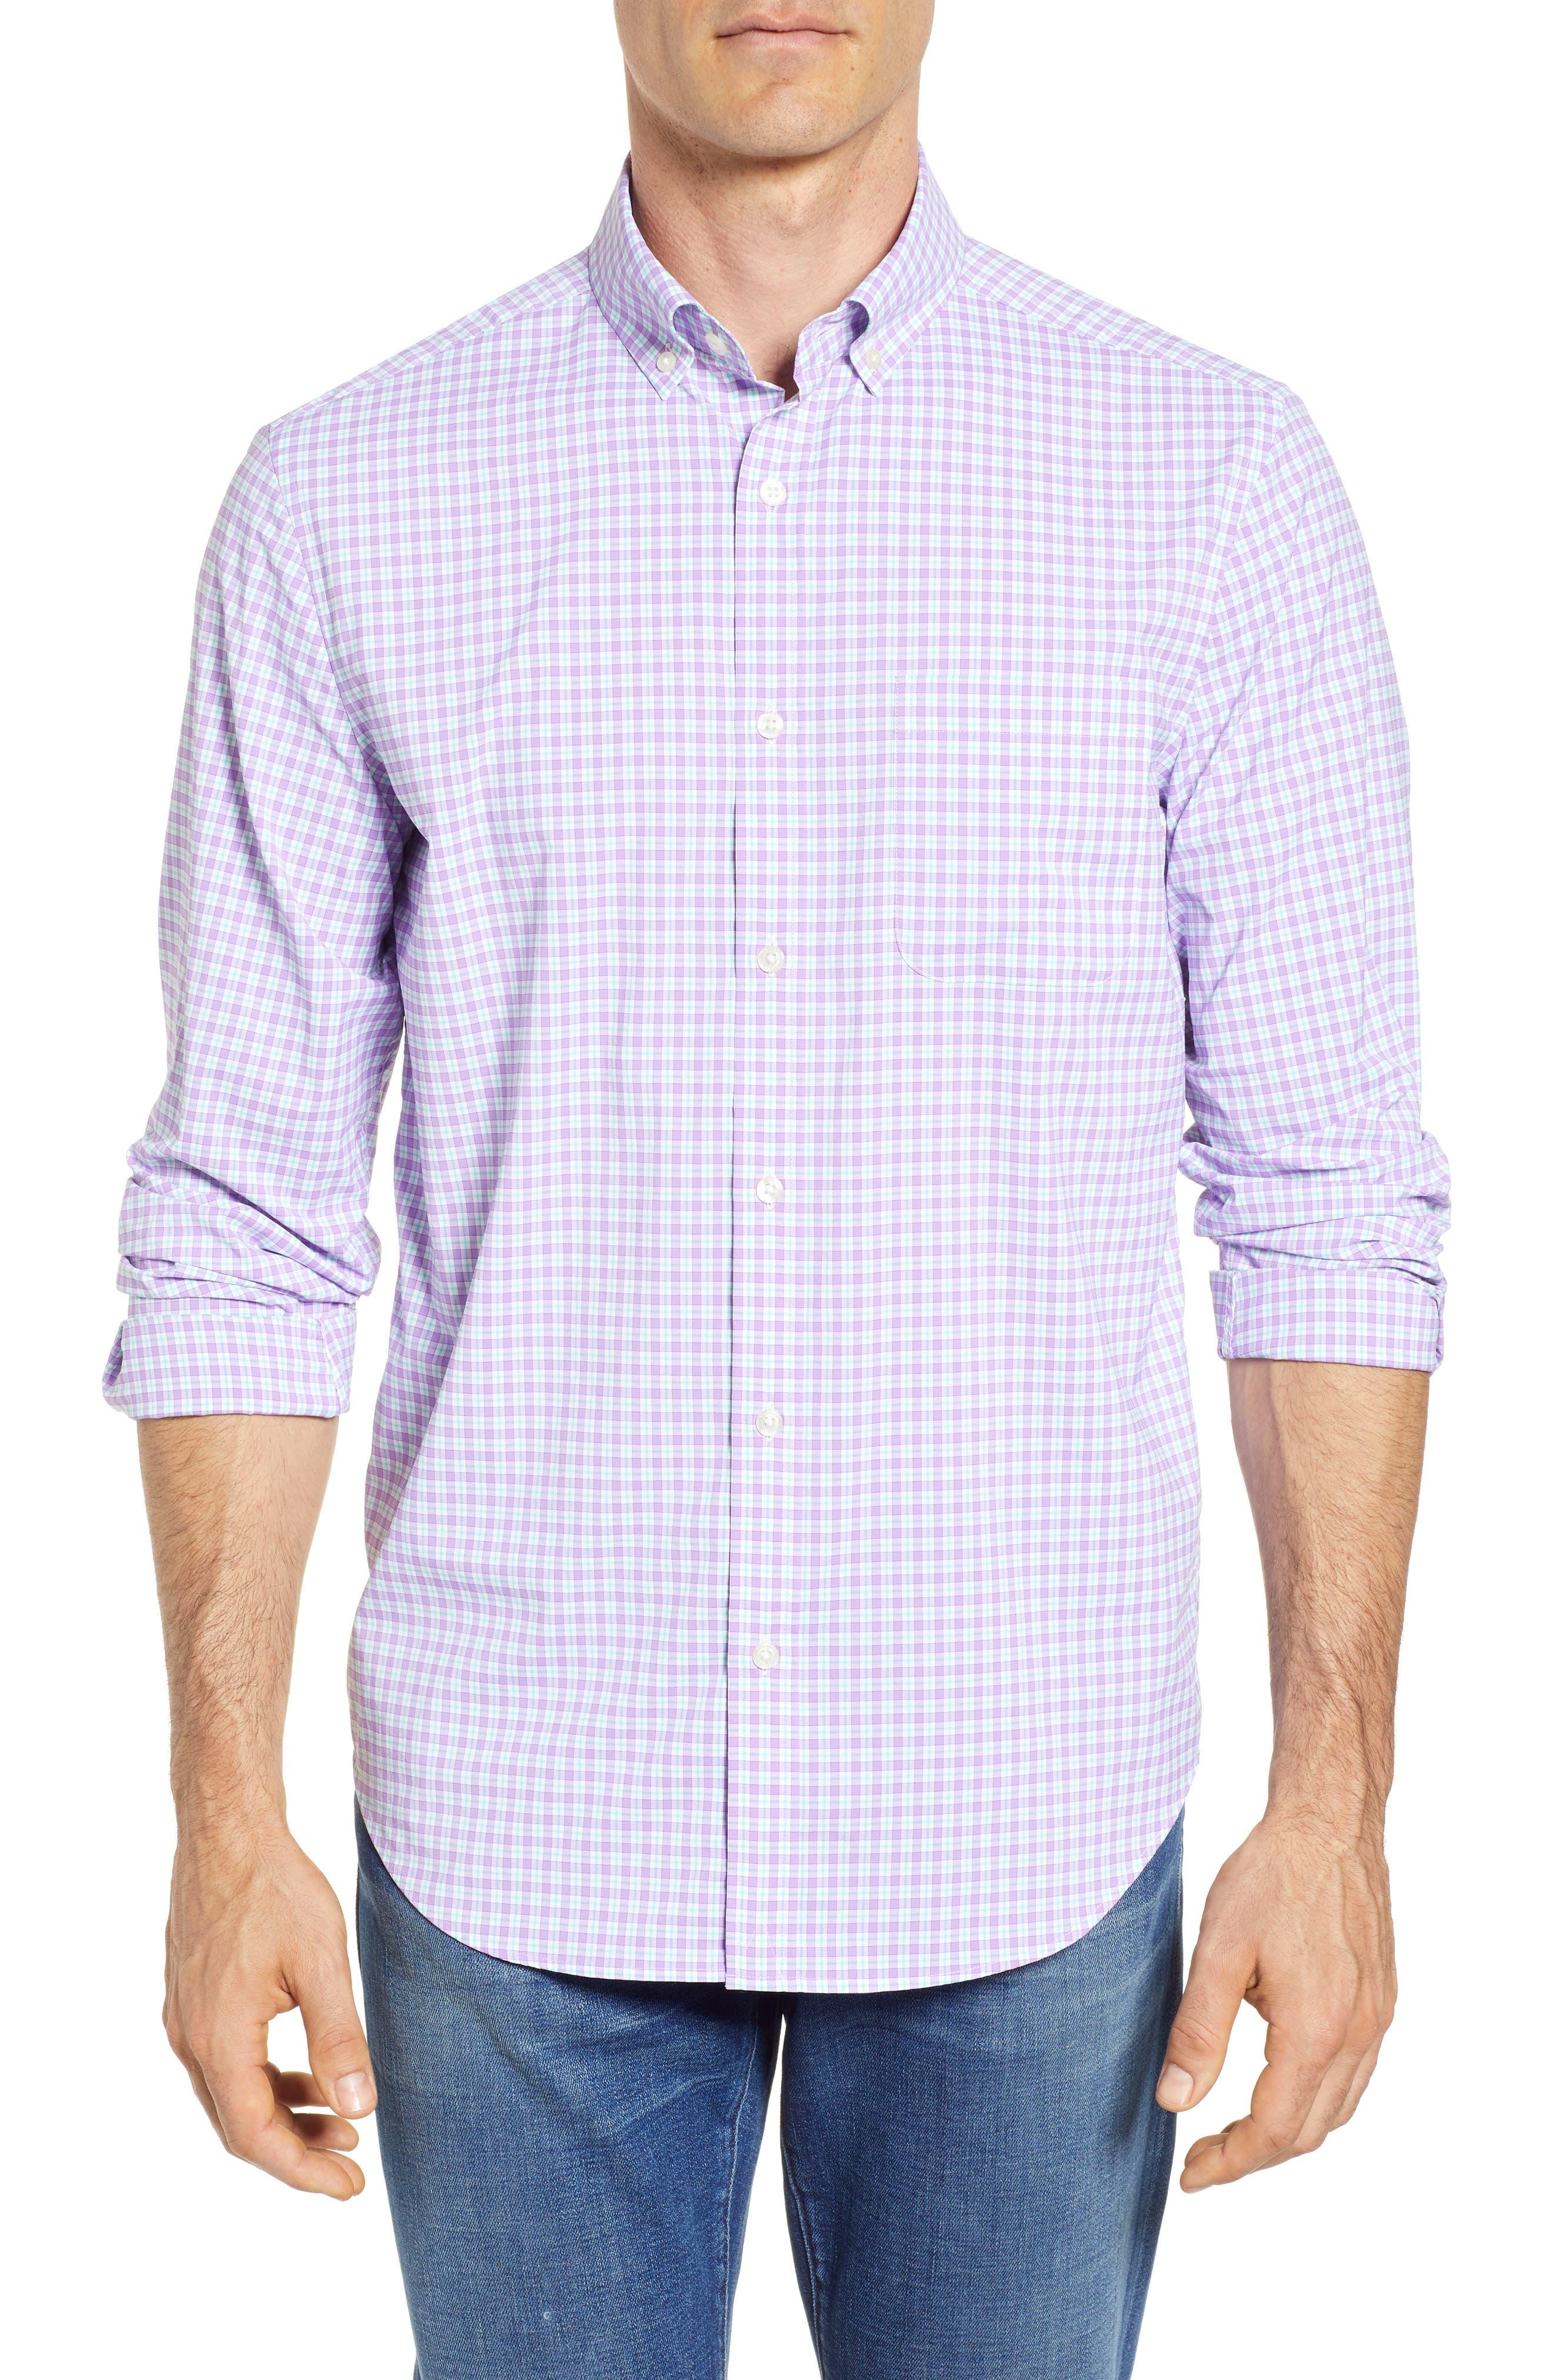 Oyster Pond Slim Fit Plaid Sport Shirt,                         Main,                         color, Sea Urchin